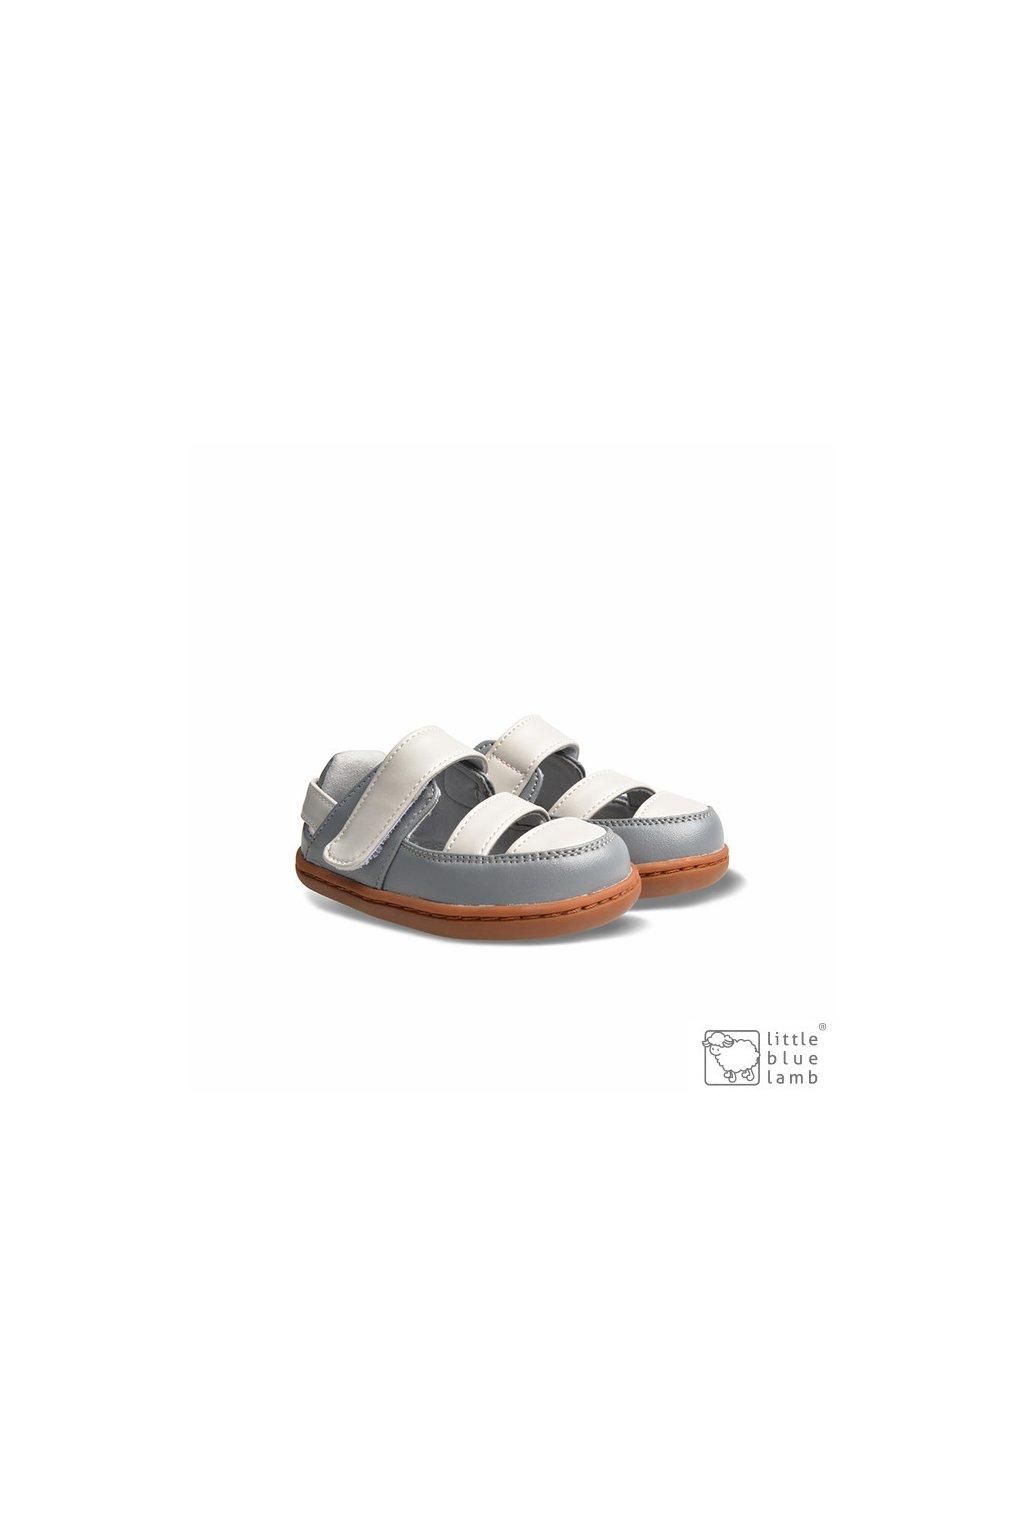 LBL -Baps Grey